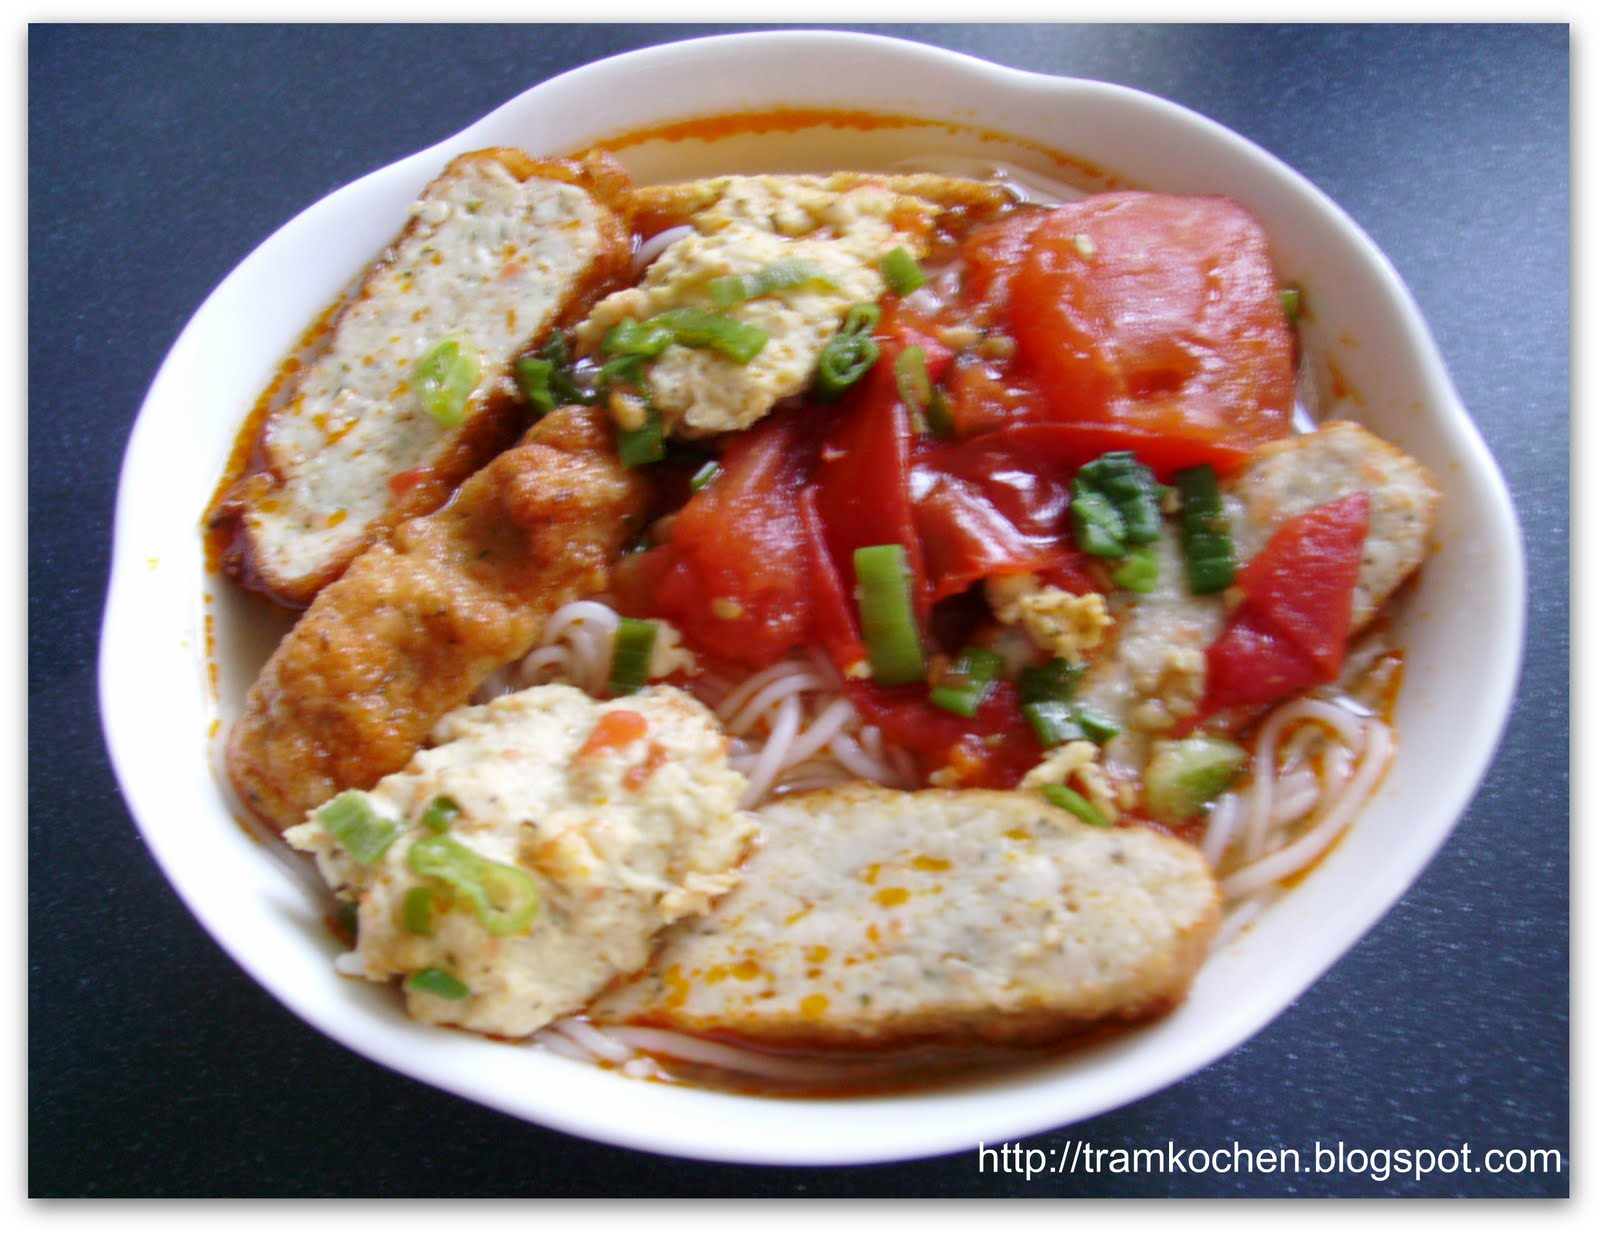 Tram\u0026#39; s kochen: B\u00fan ch\u1ea3 c\u00e1 Nha Trang